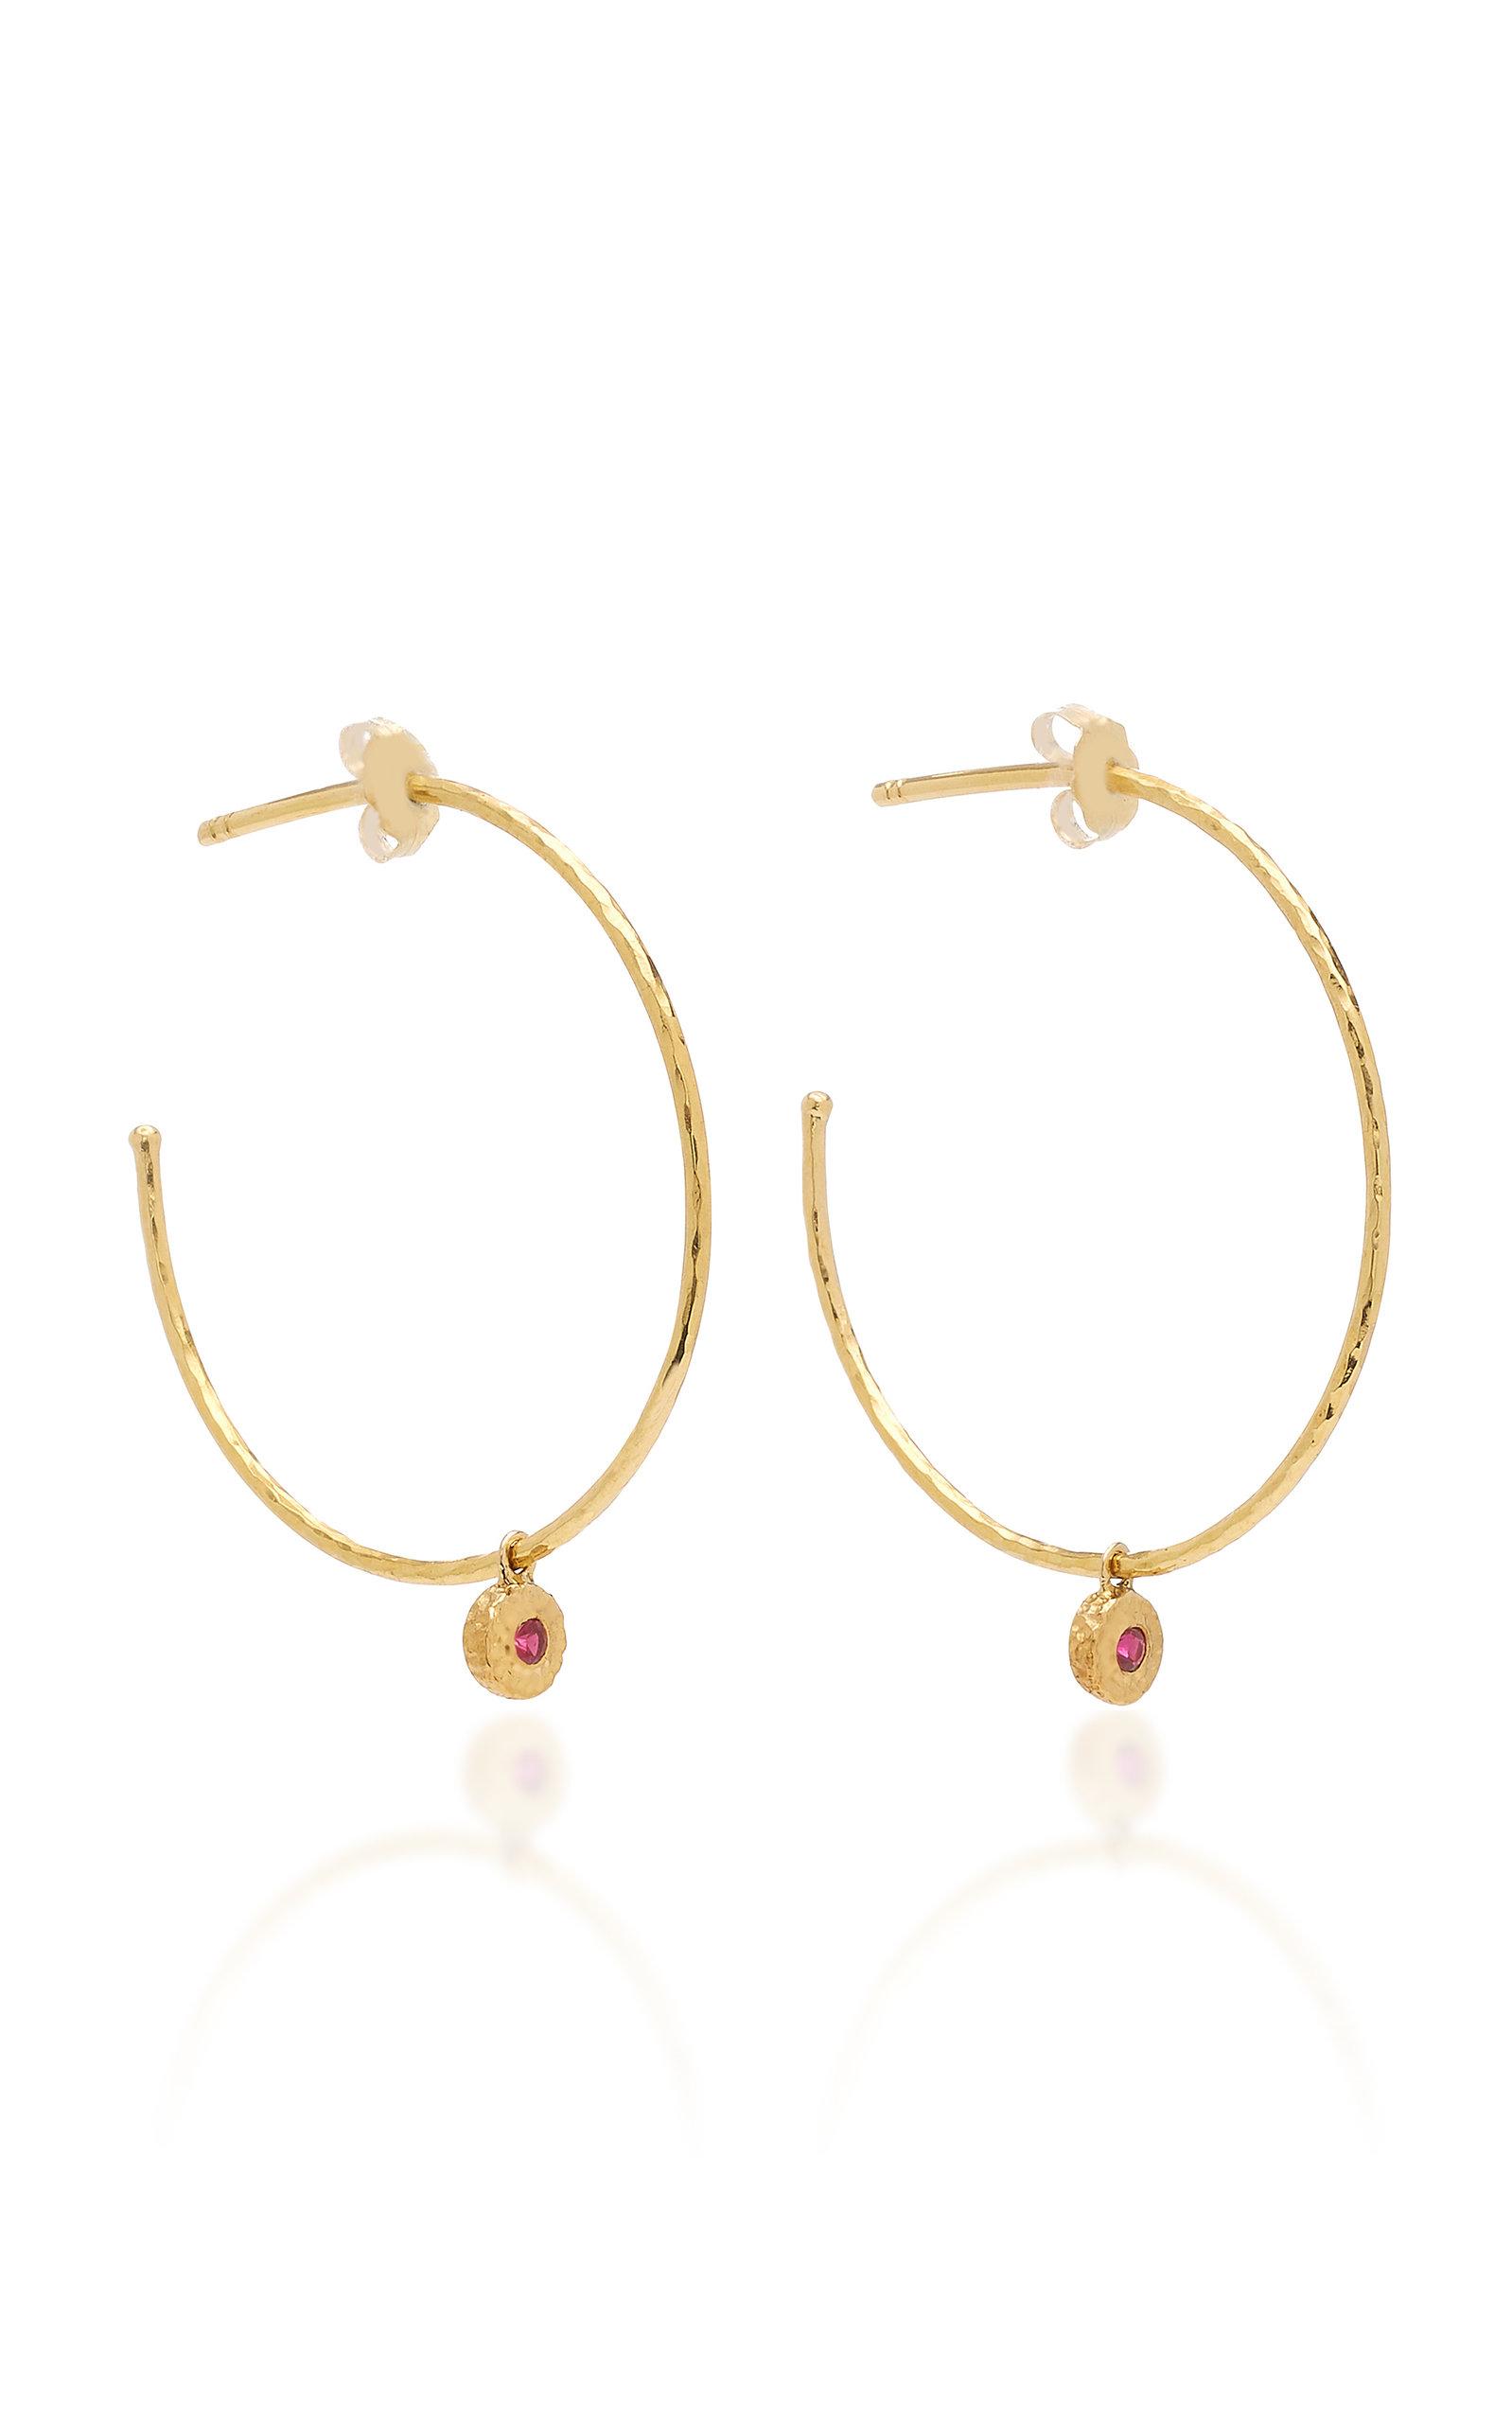 06212728a Nesting Gem Ruby and 18K Gold Hoop Earrings by Octavia Elizabeth ...